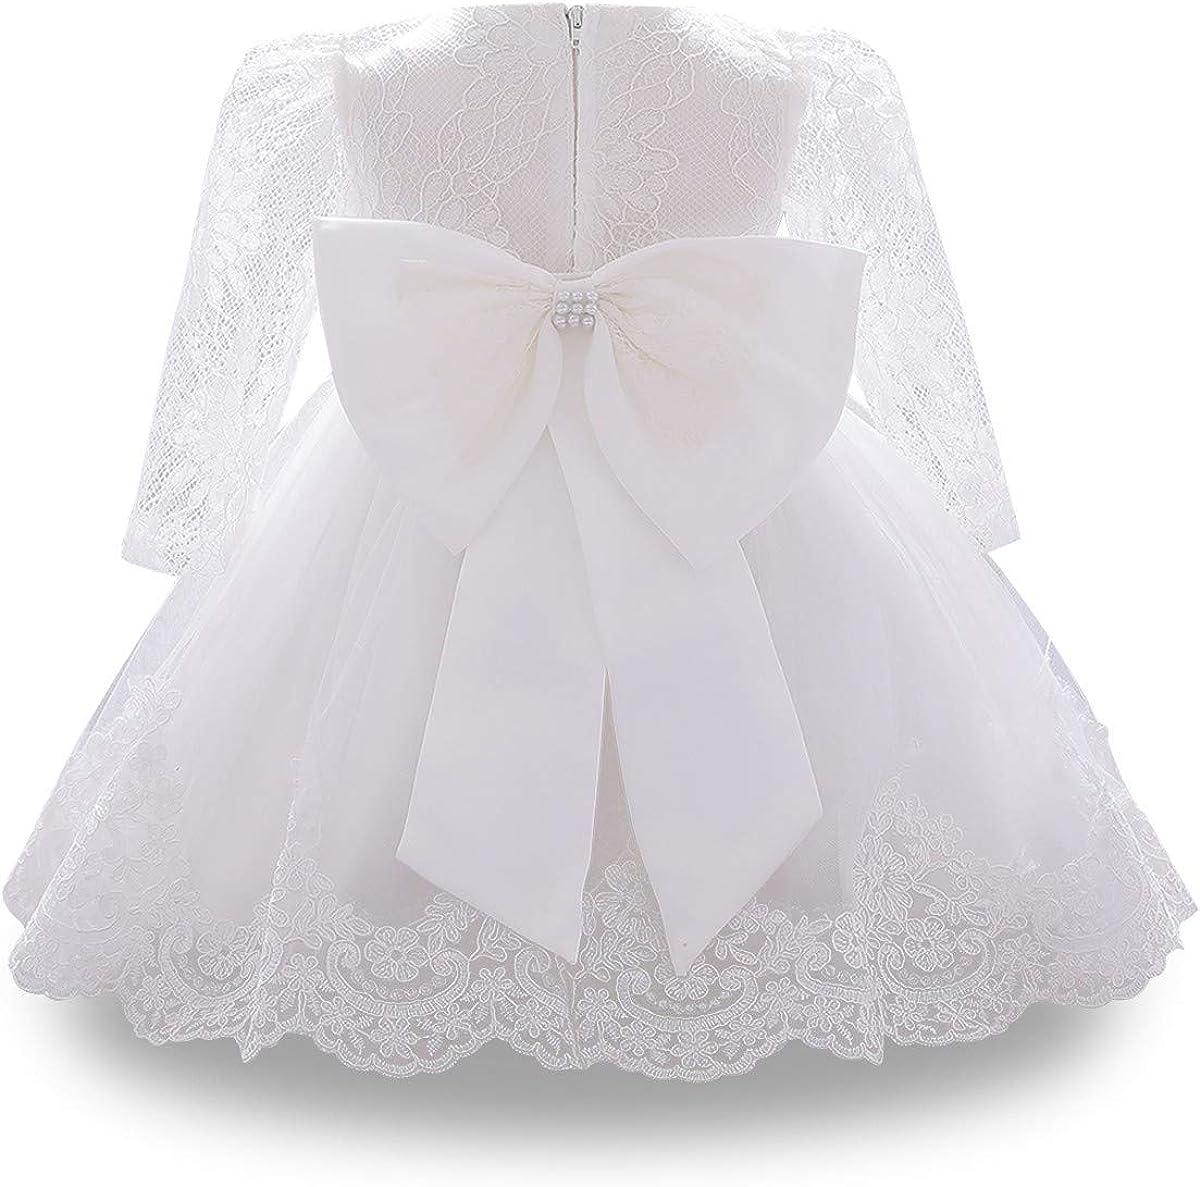 HIHCBF Baby Girls 1st Sale special price Birthday Smash Prin Christening New arrival Cake Dress